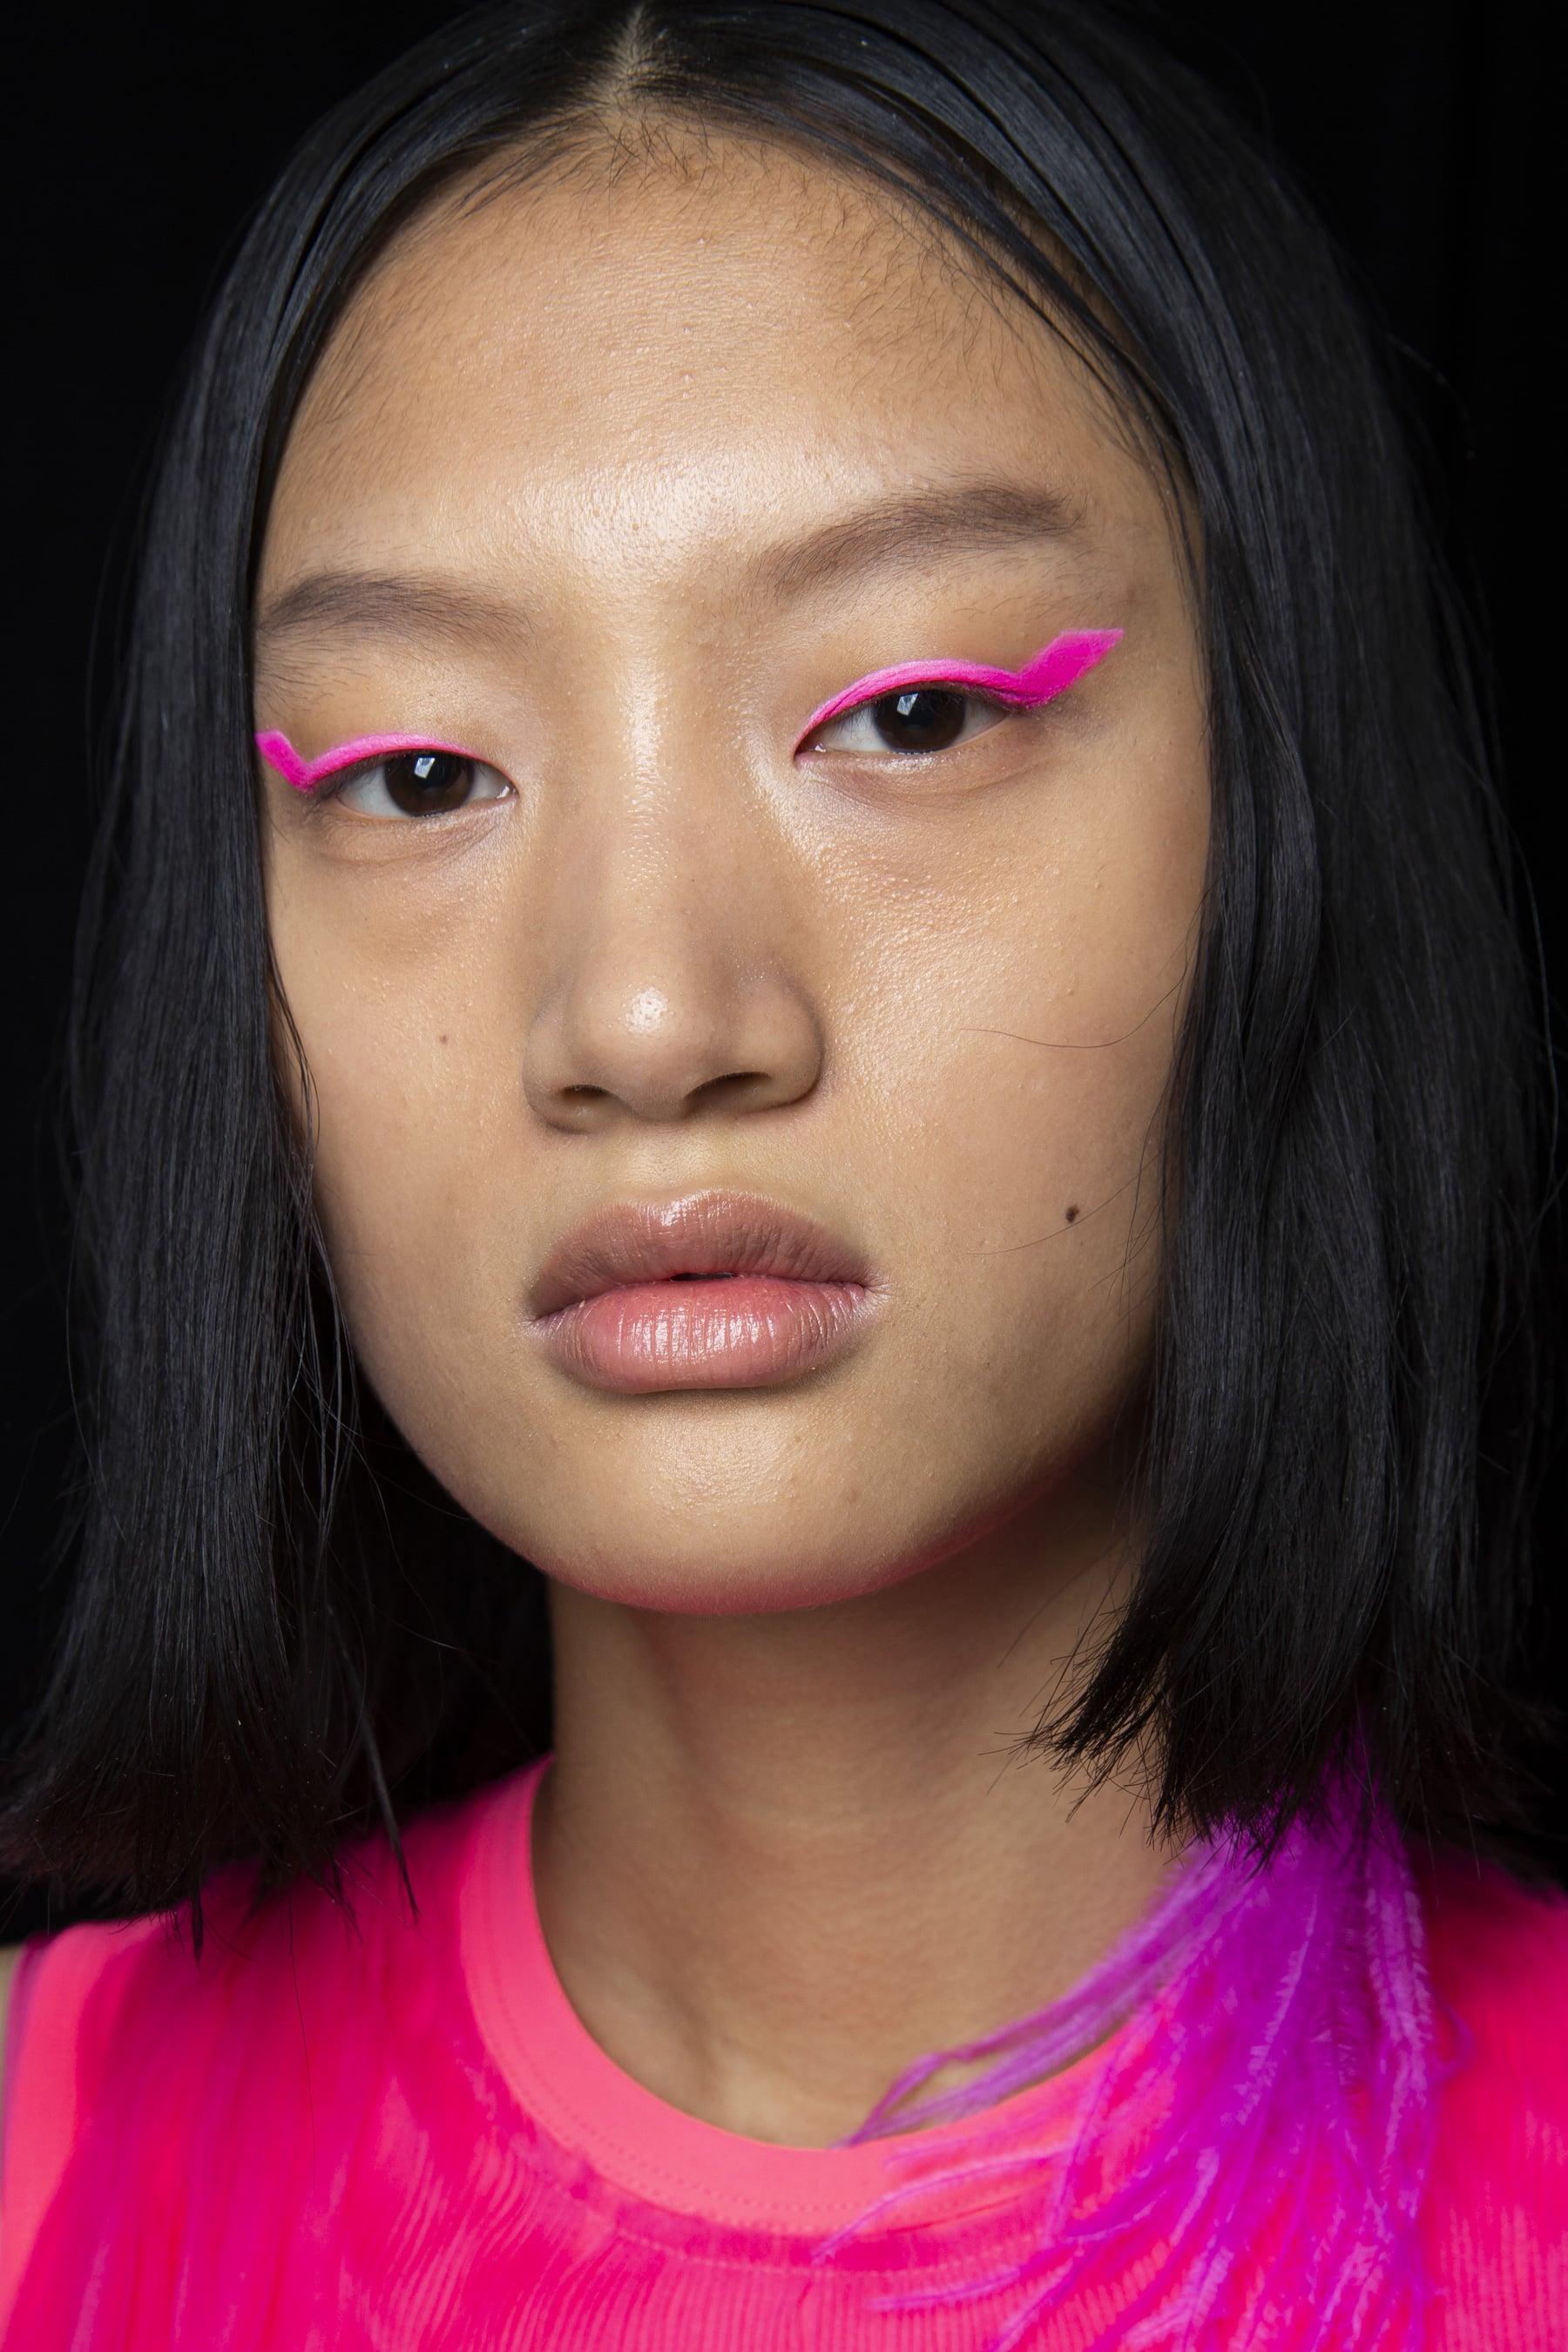 2020 Beauty Trends.Spring 2020 Runway Beauty Trends Shocks Of Neon The Best